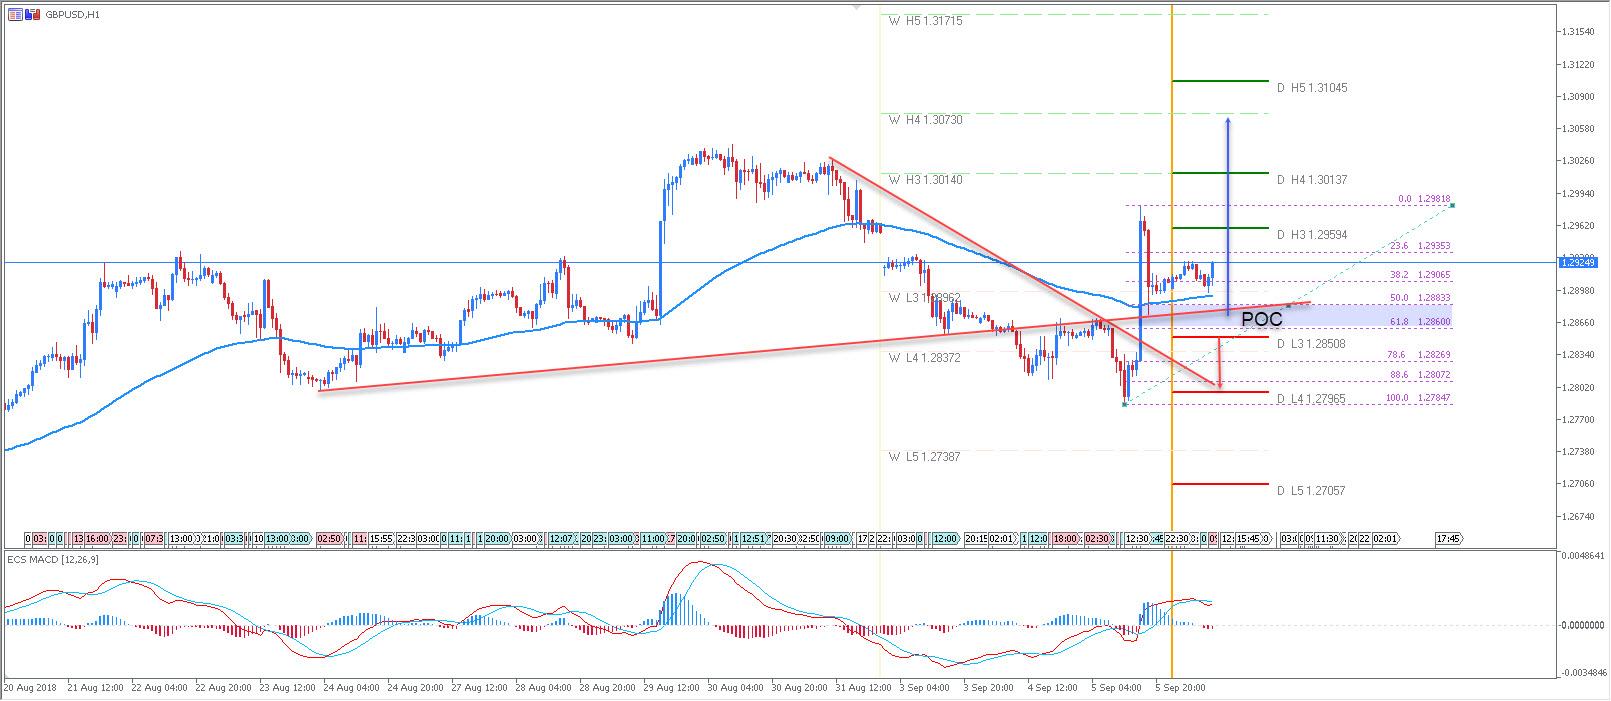 GBP/USD Bullish Above 1.2850